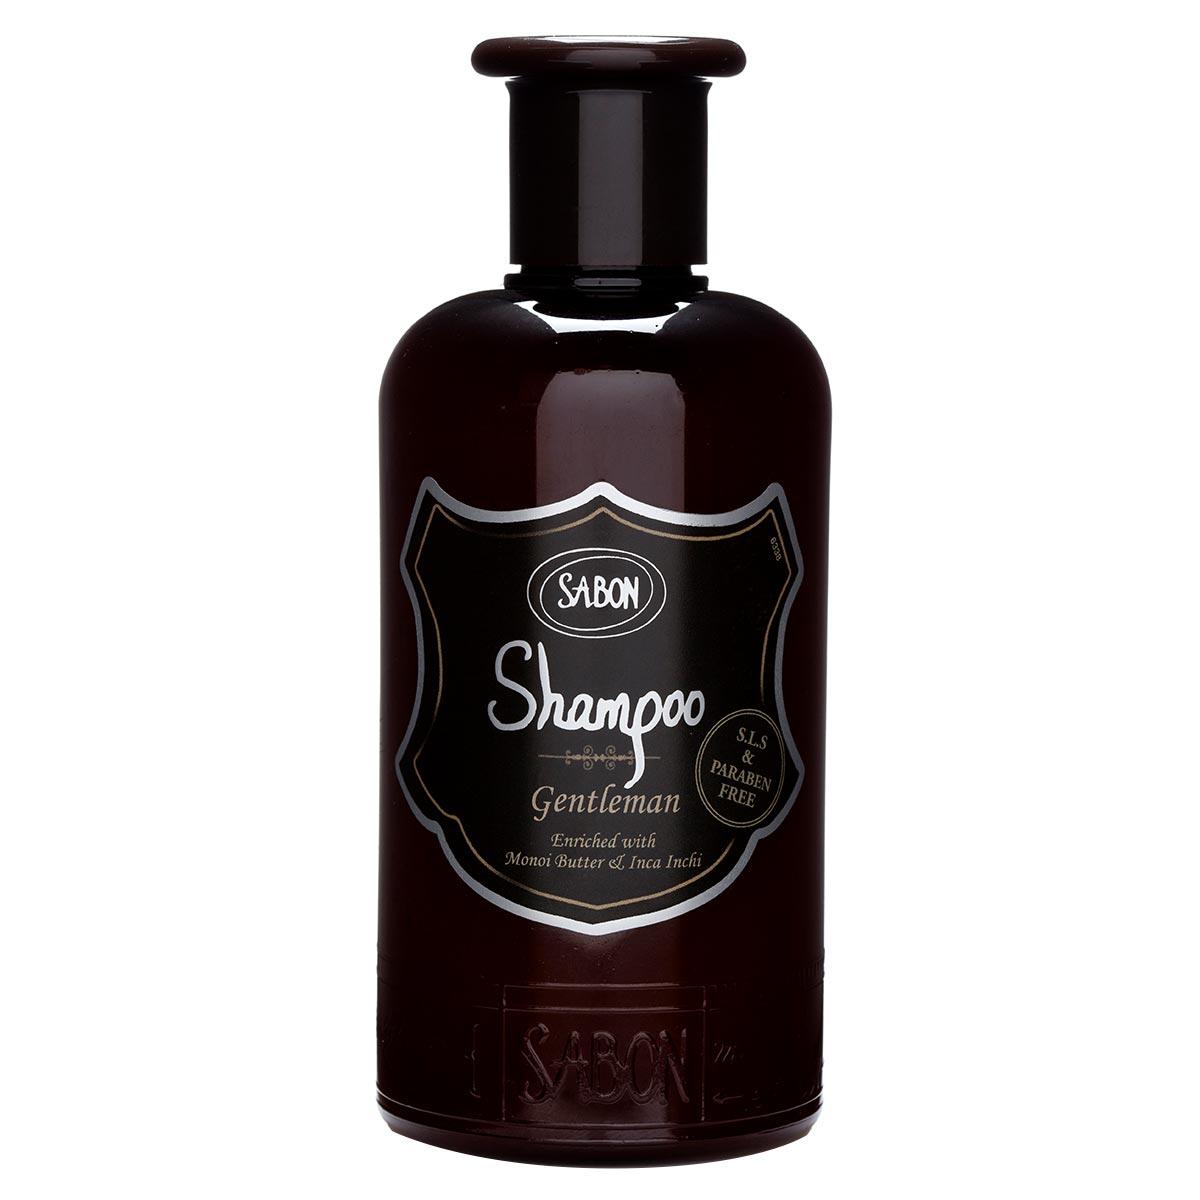 Shampoo - Gentleman